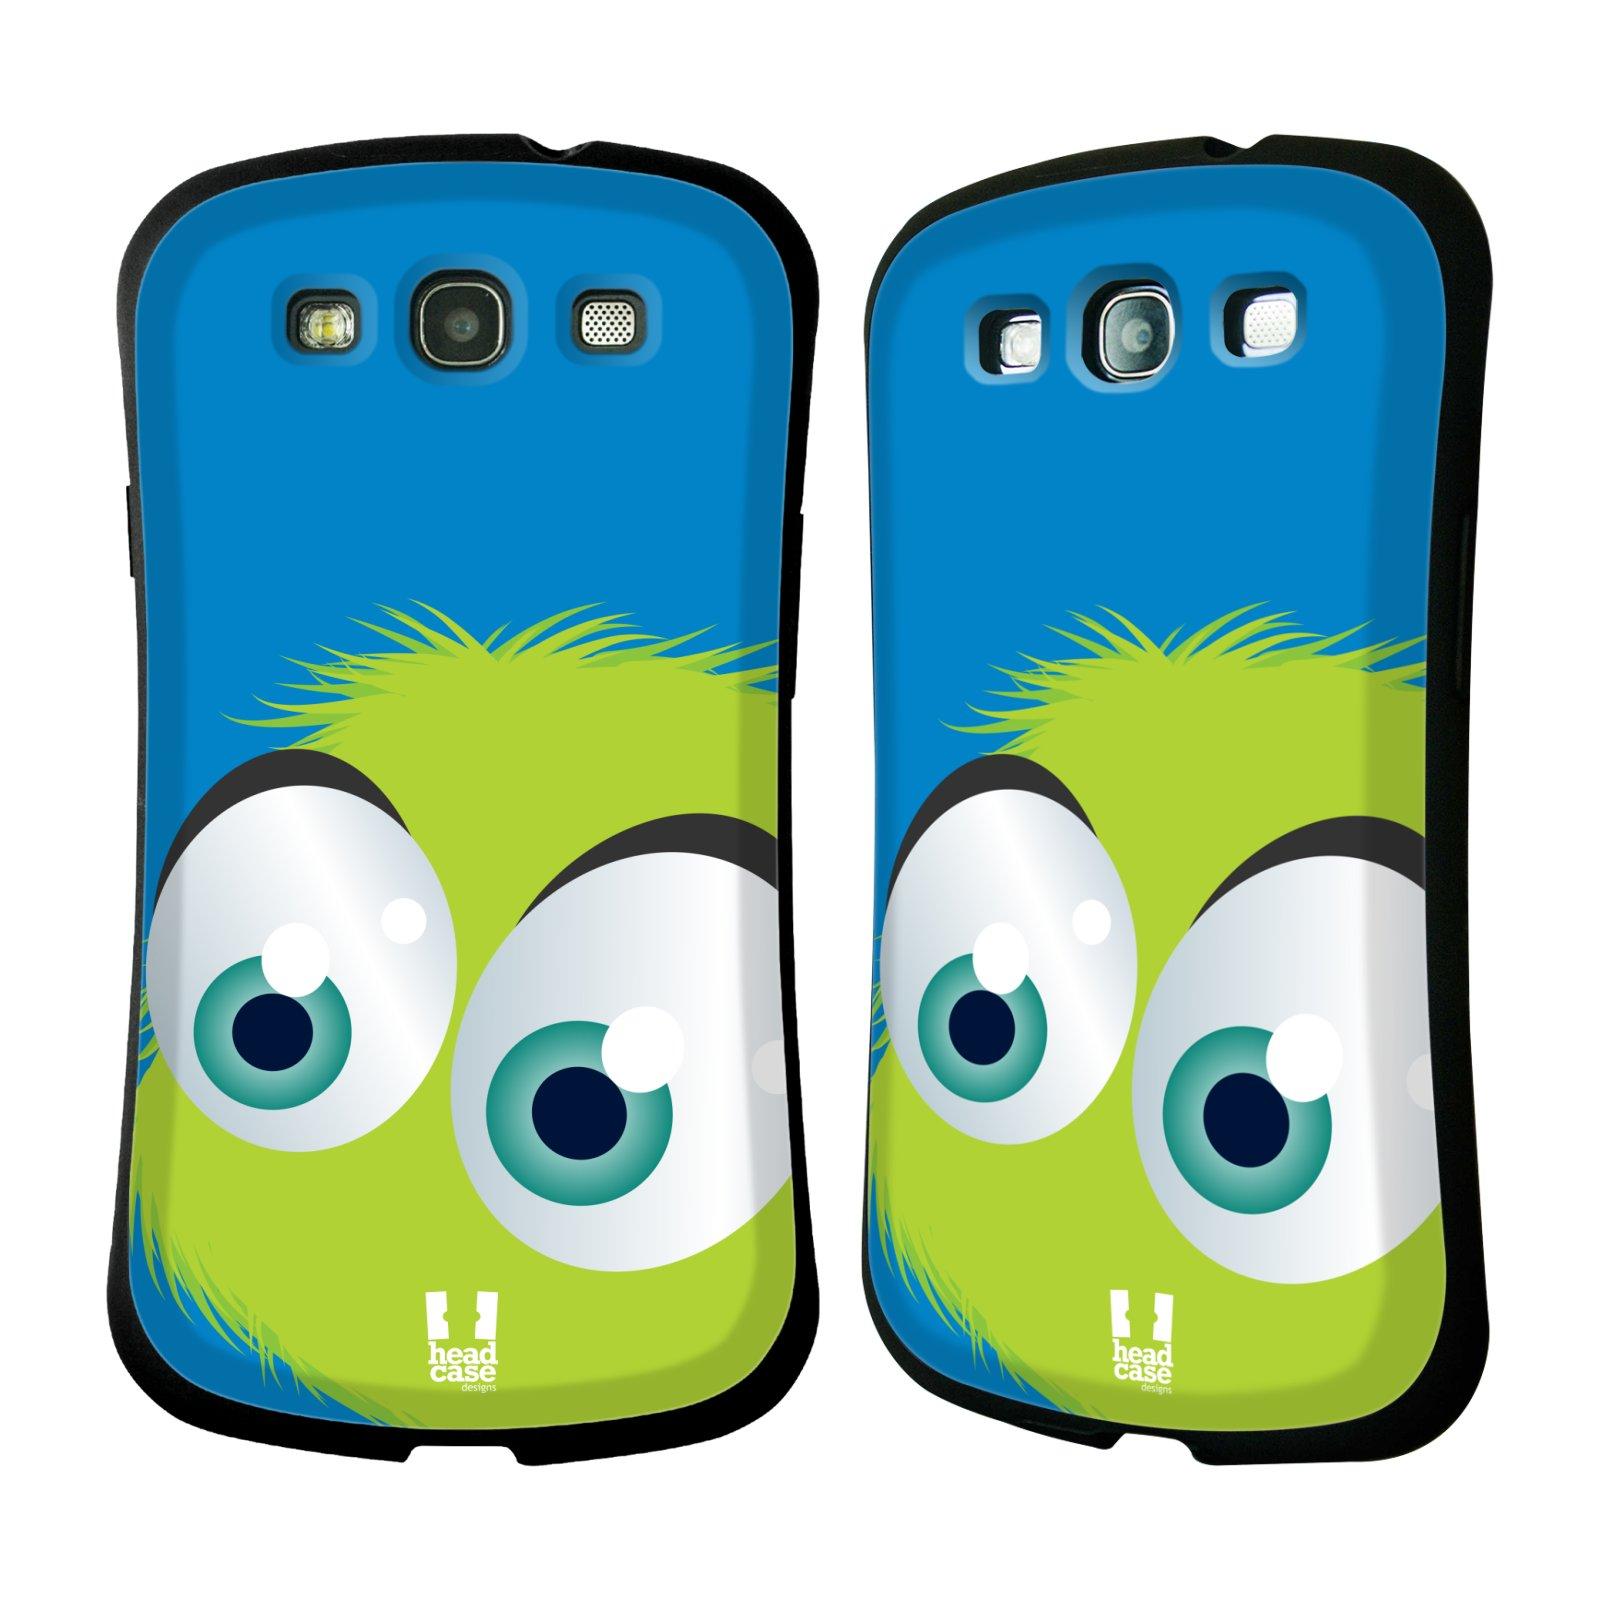 Nárazuvzdorné pouzdro na mobil Samsung Galaxy S III HEAD CASE FUZÍK ZELENÝ (Odolný nárazuvzdorný silikonový kryt či obal na mobilní telefon Samsung Galaxy S III GT-i9300)